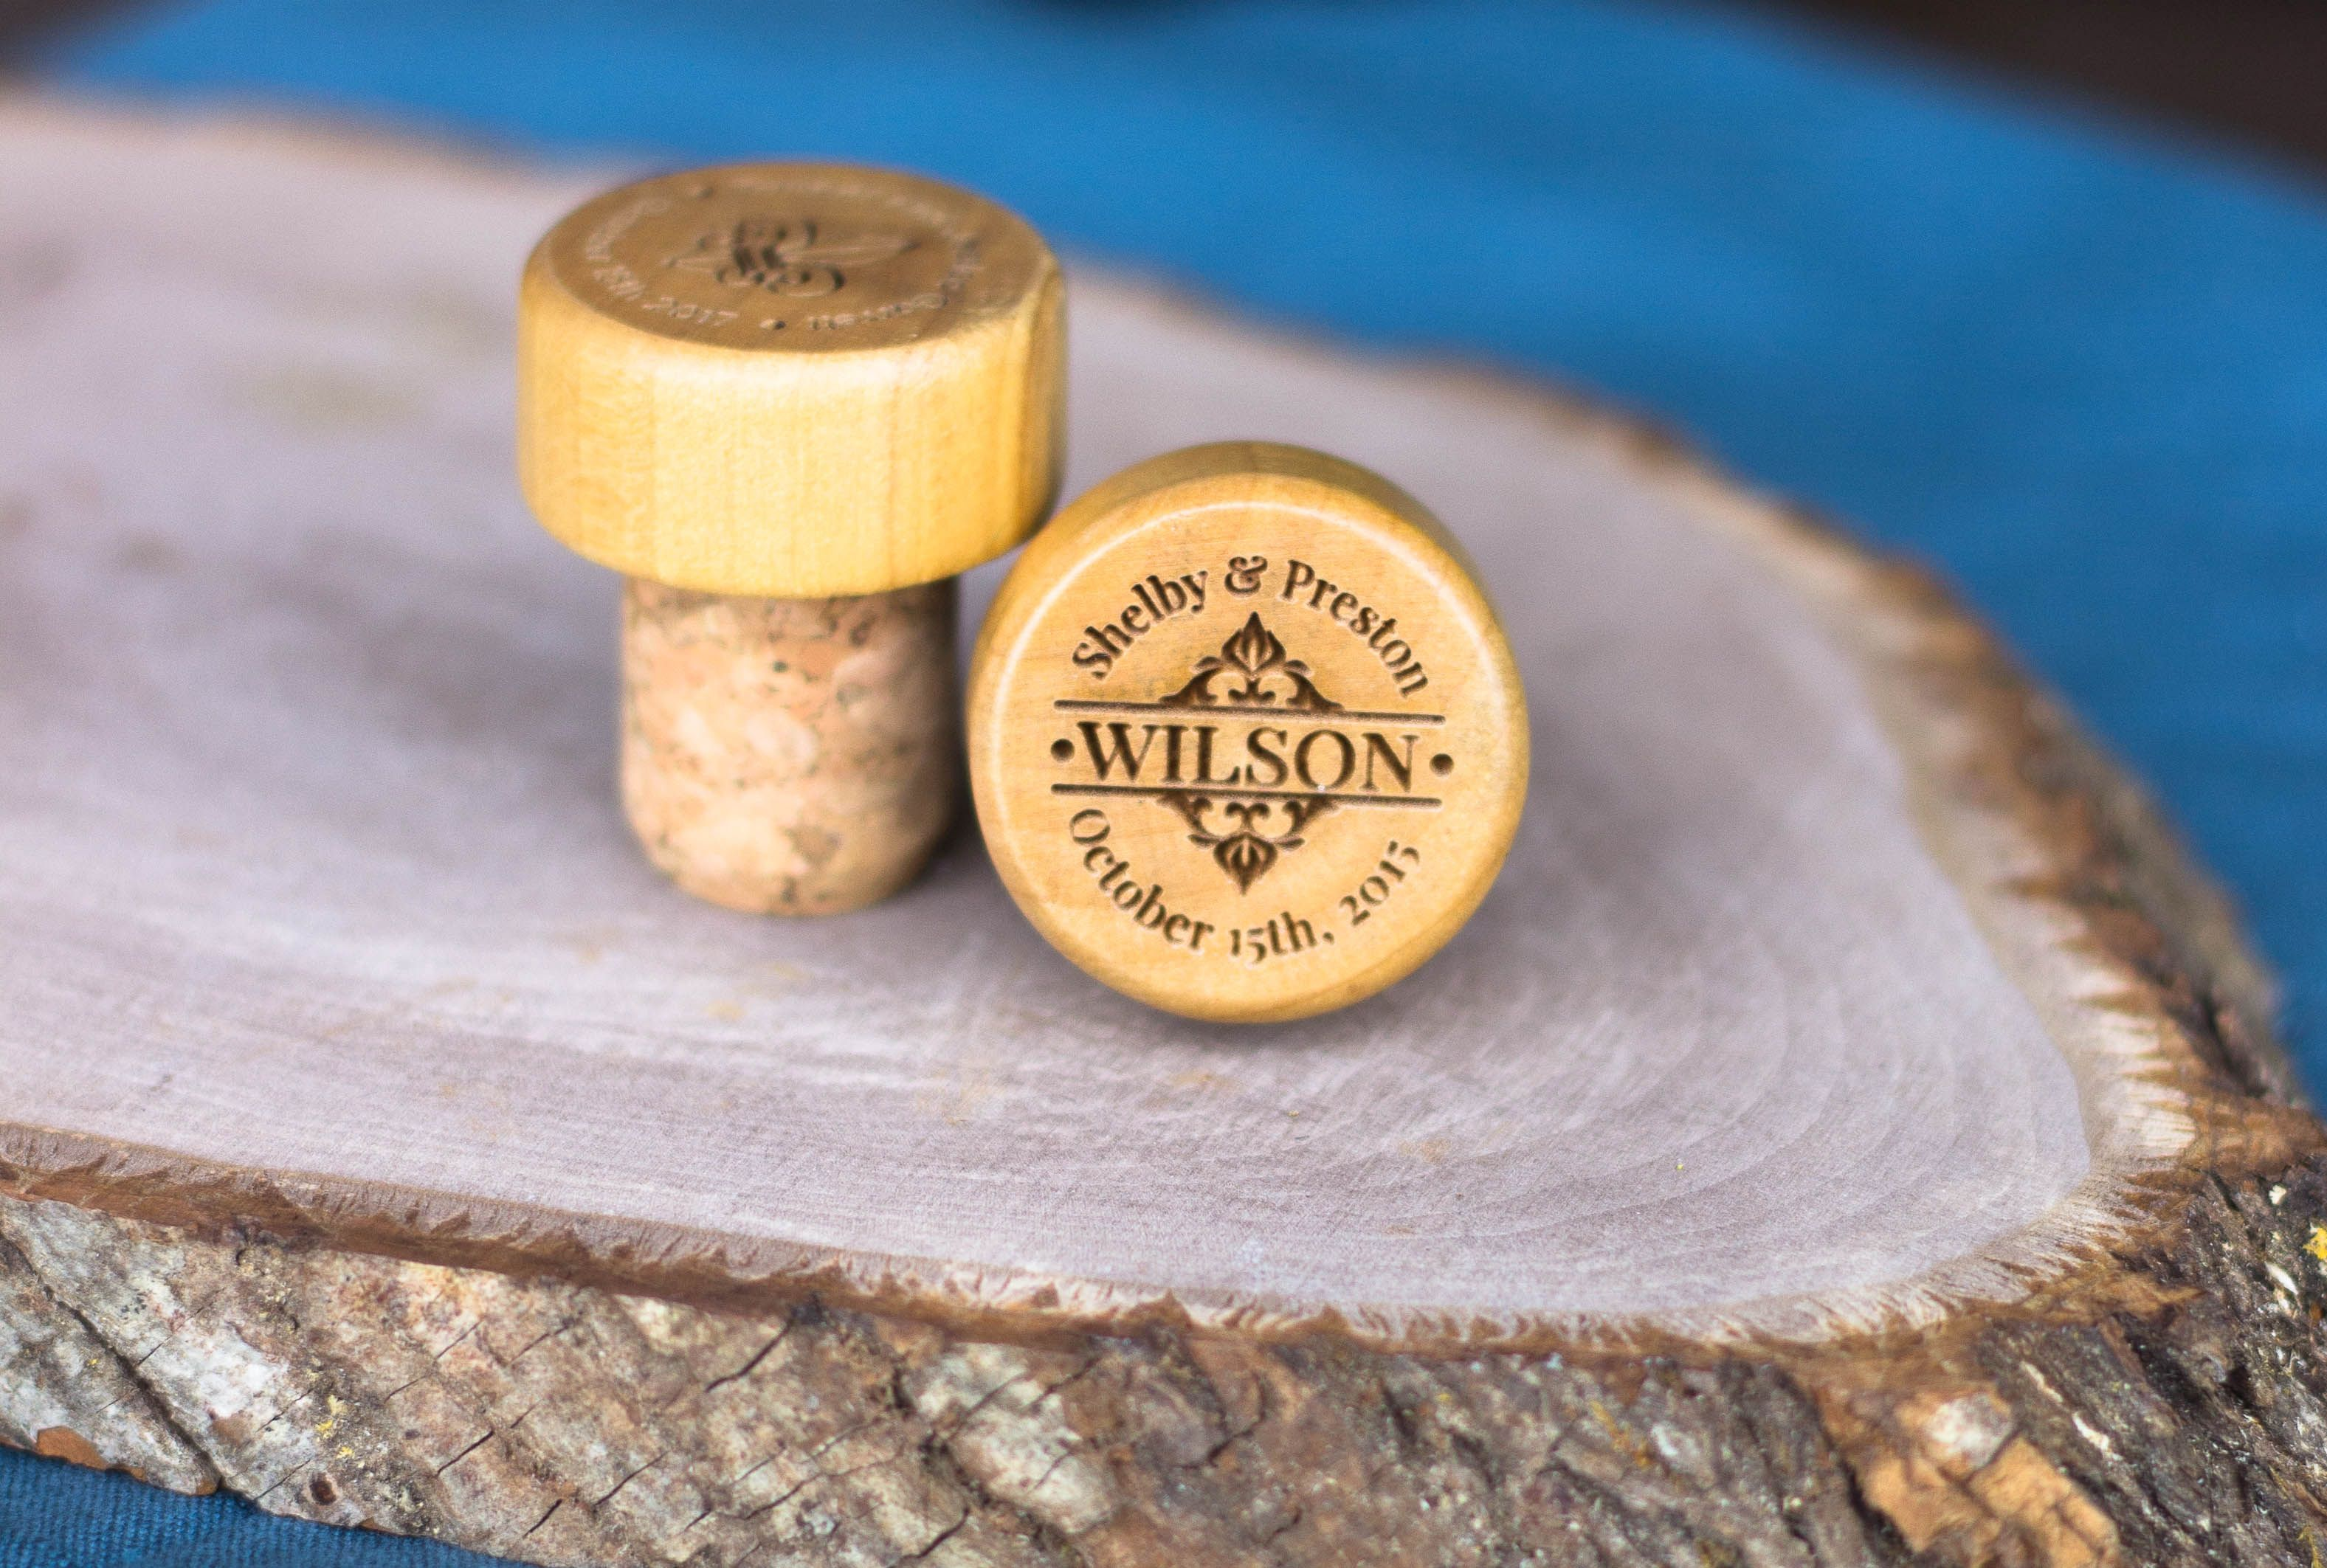 Personalized WIne Cork Bottle Stopper wedding favors | TCGCC Ideas ...